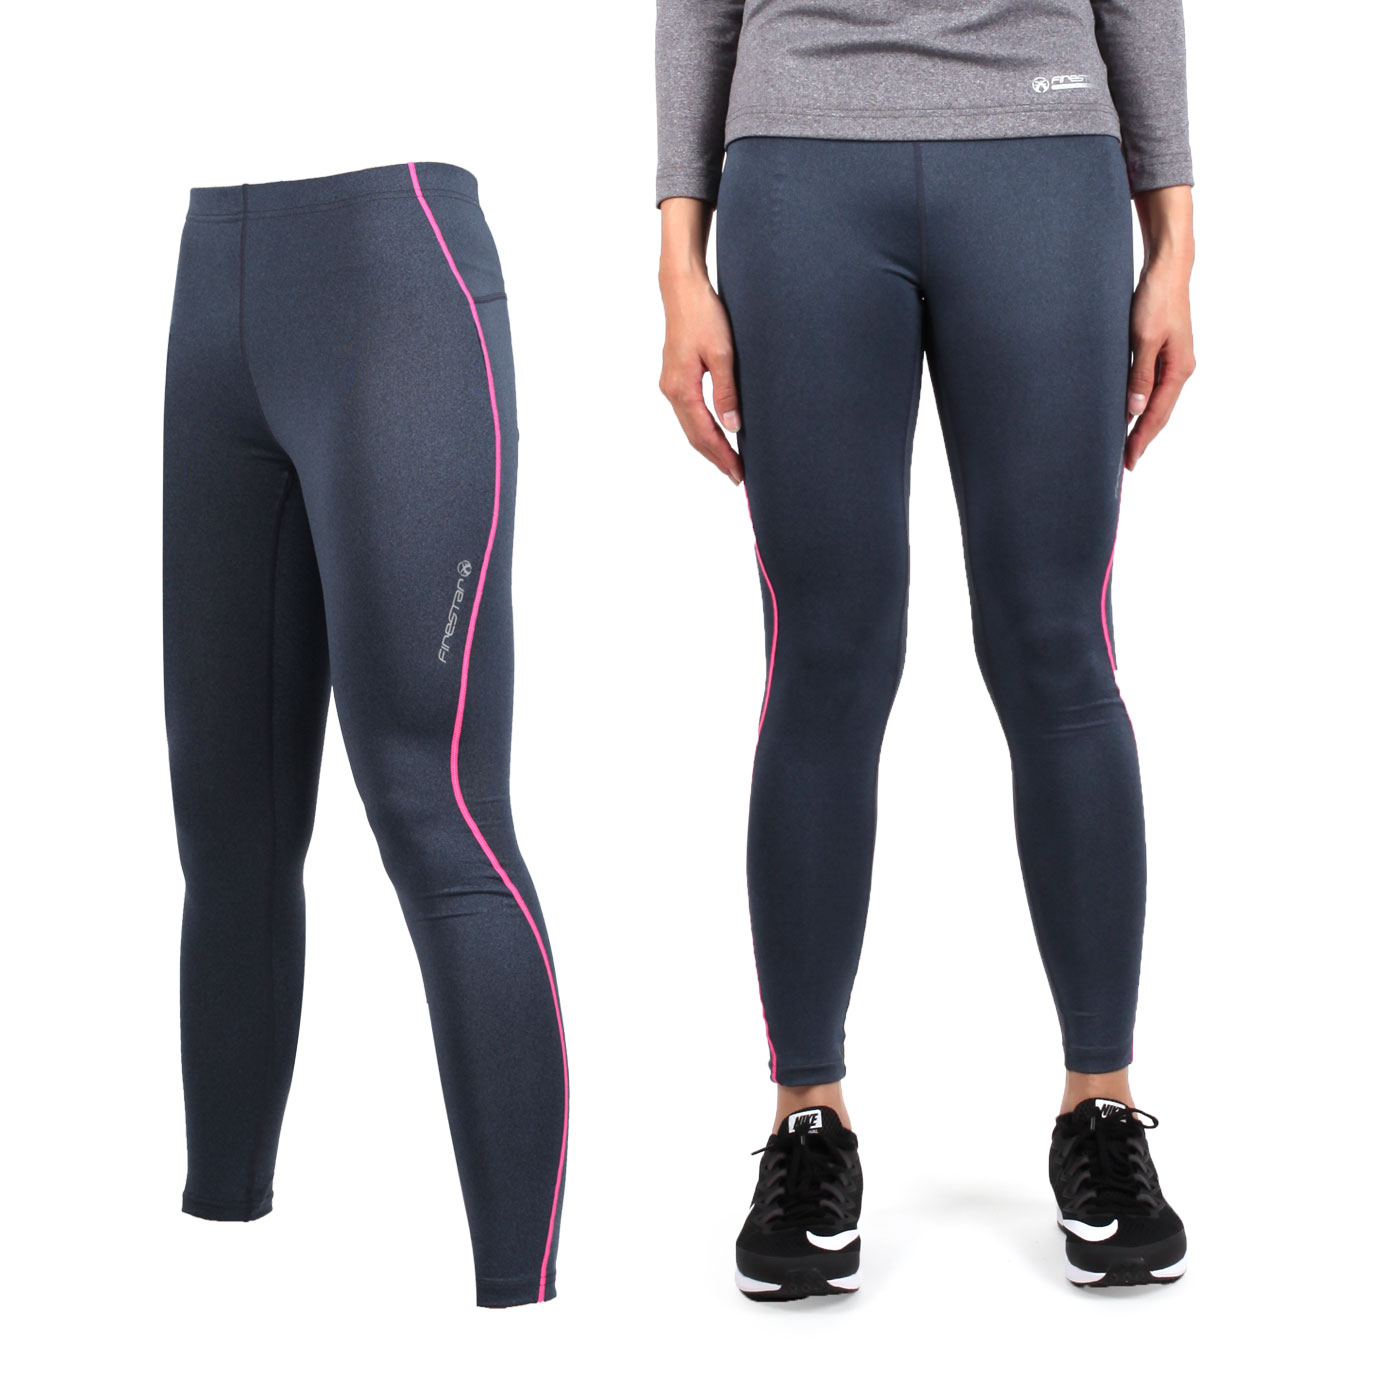 FIRESTAR 女款機能緊身長褲 NL707-18 - 深灰螢光粉